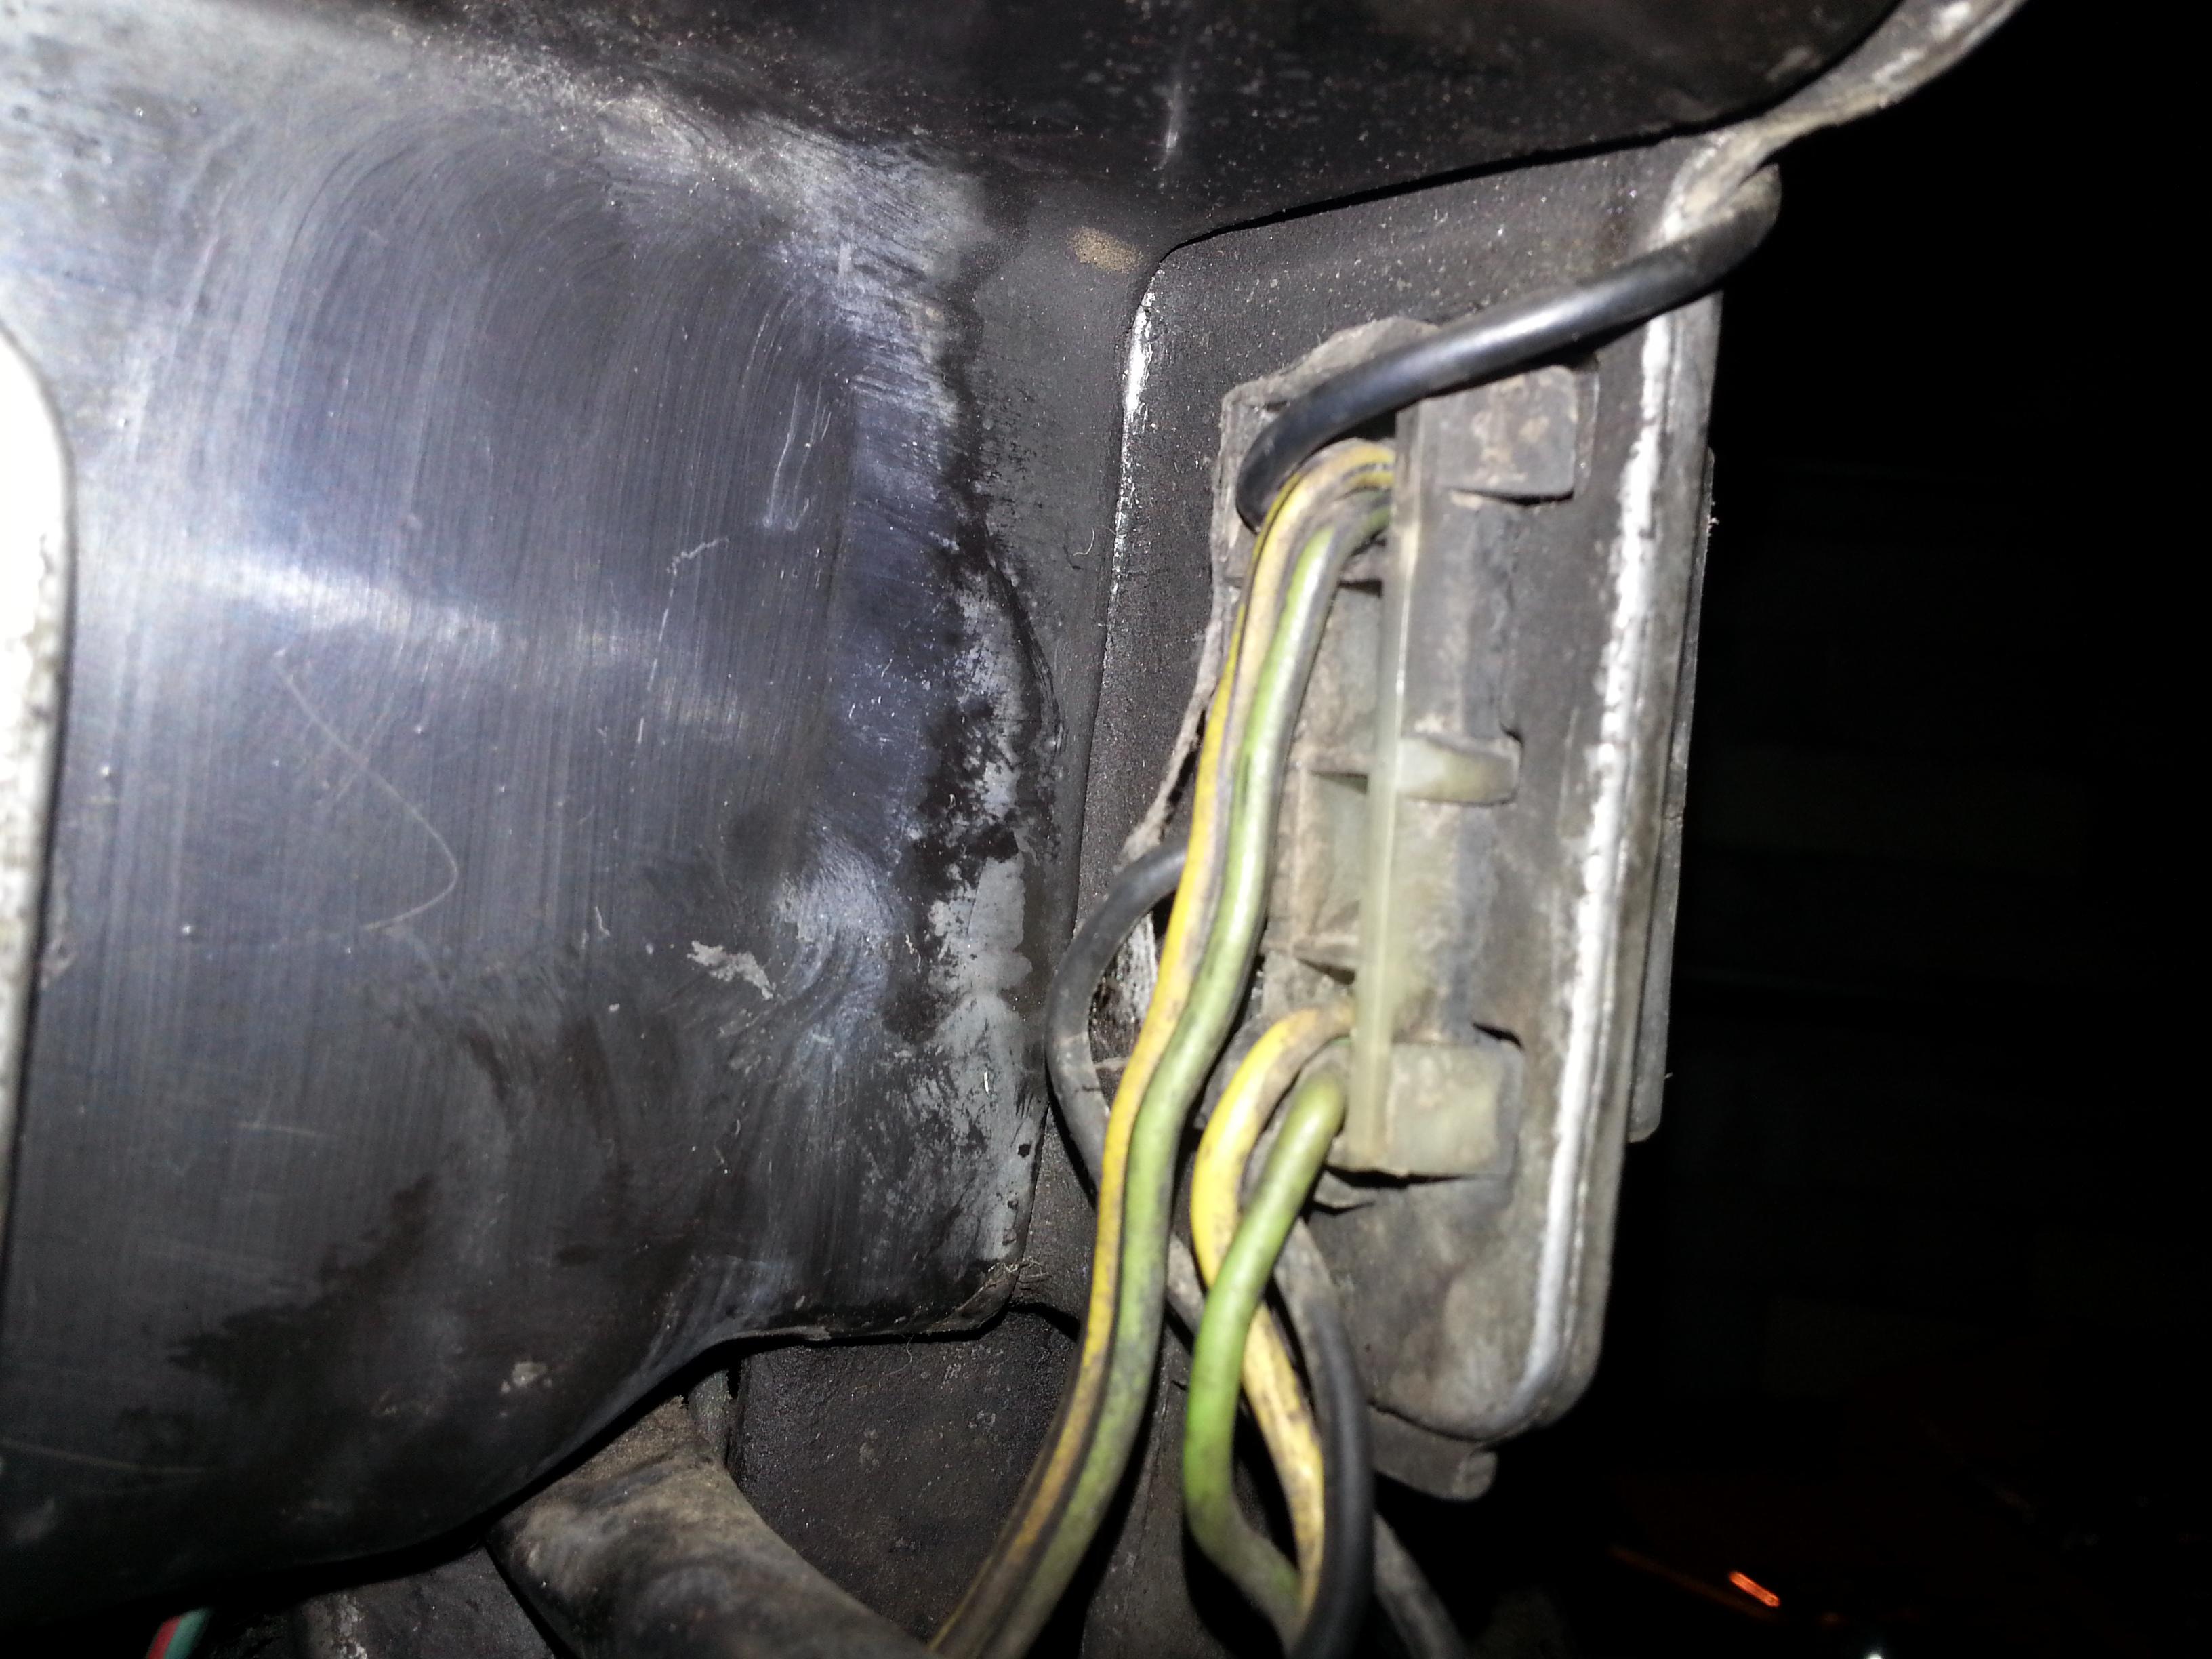 WRG-0721] Rotax 503 Wiring Harness